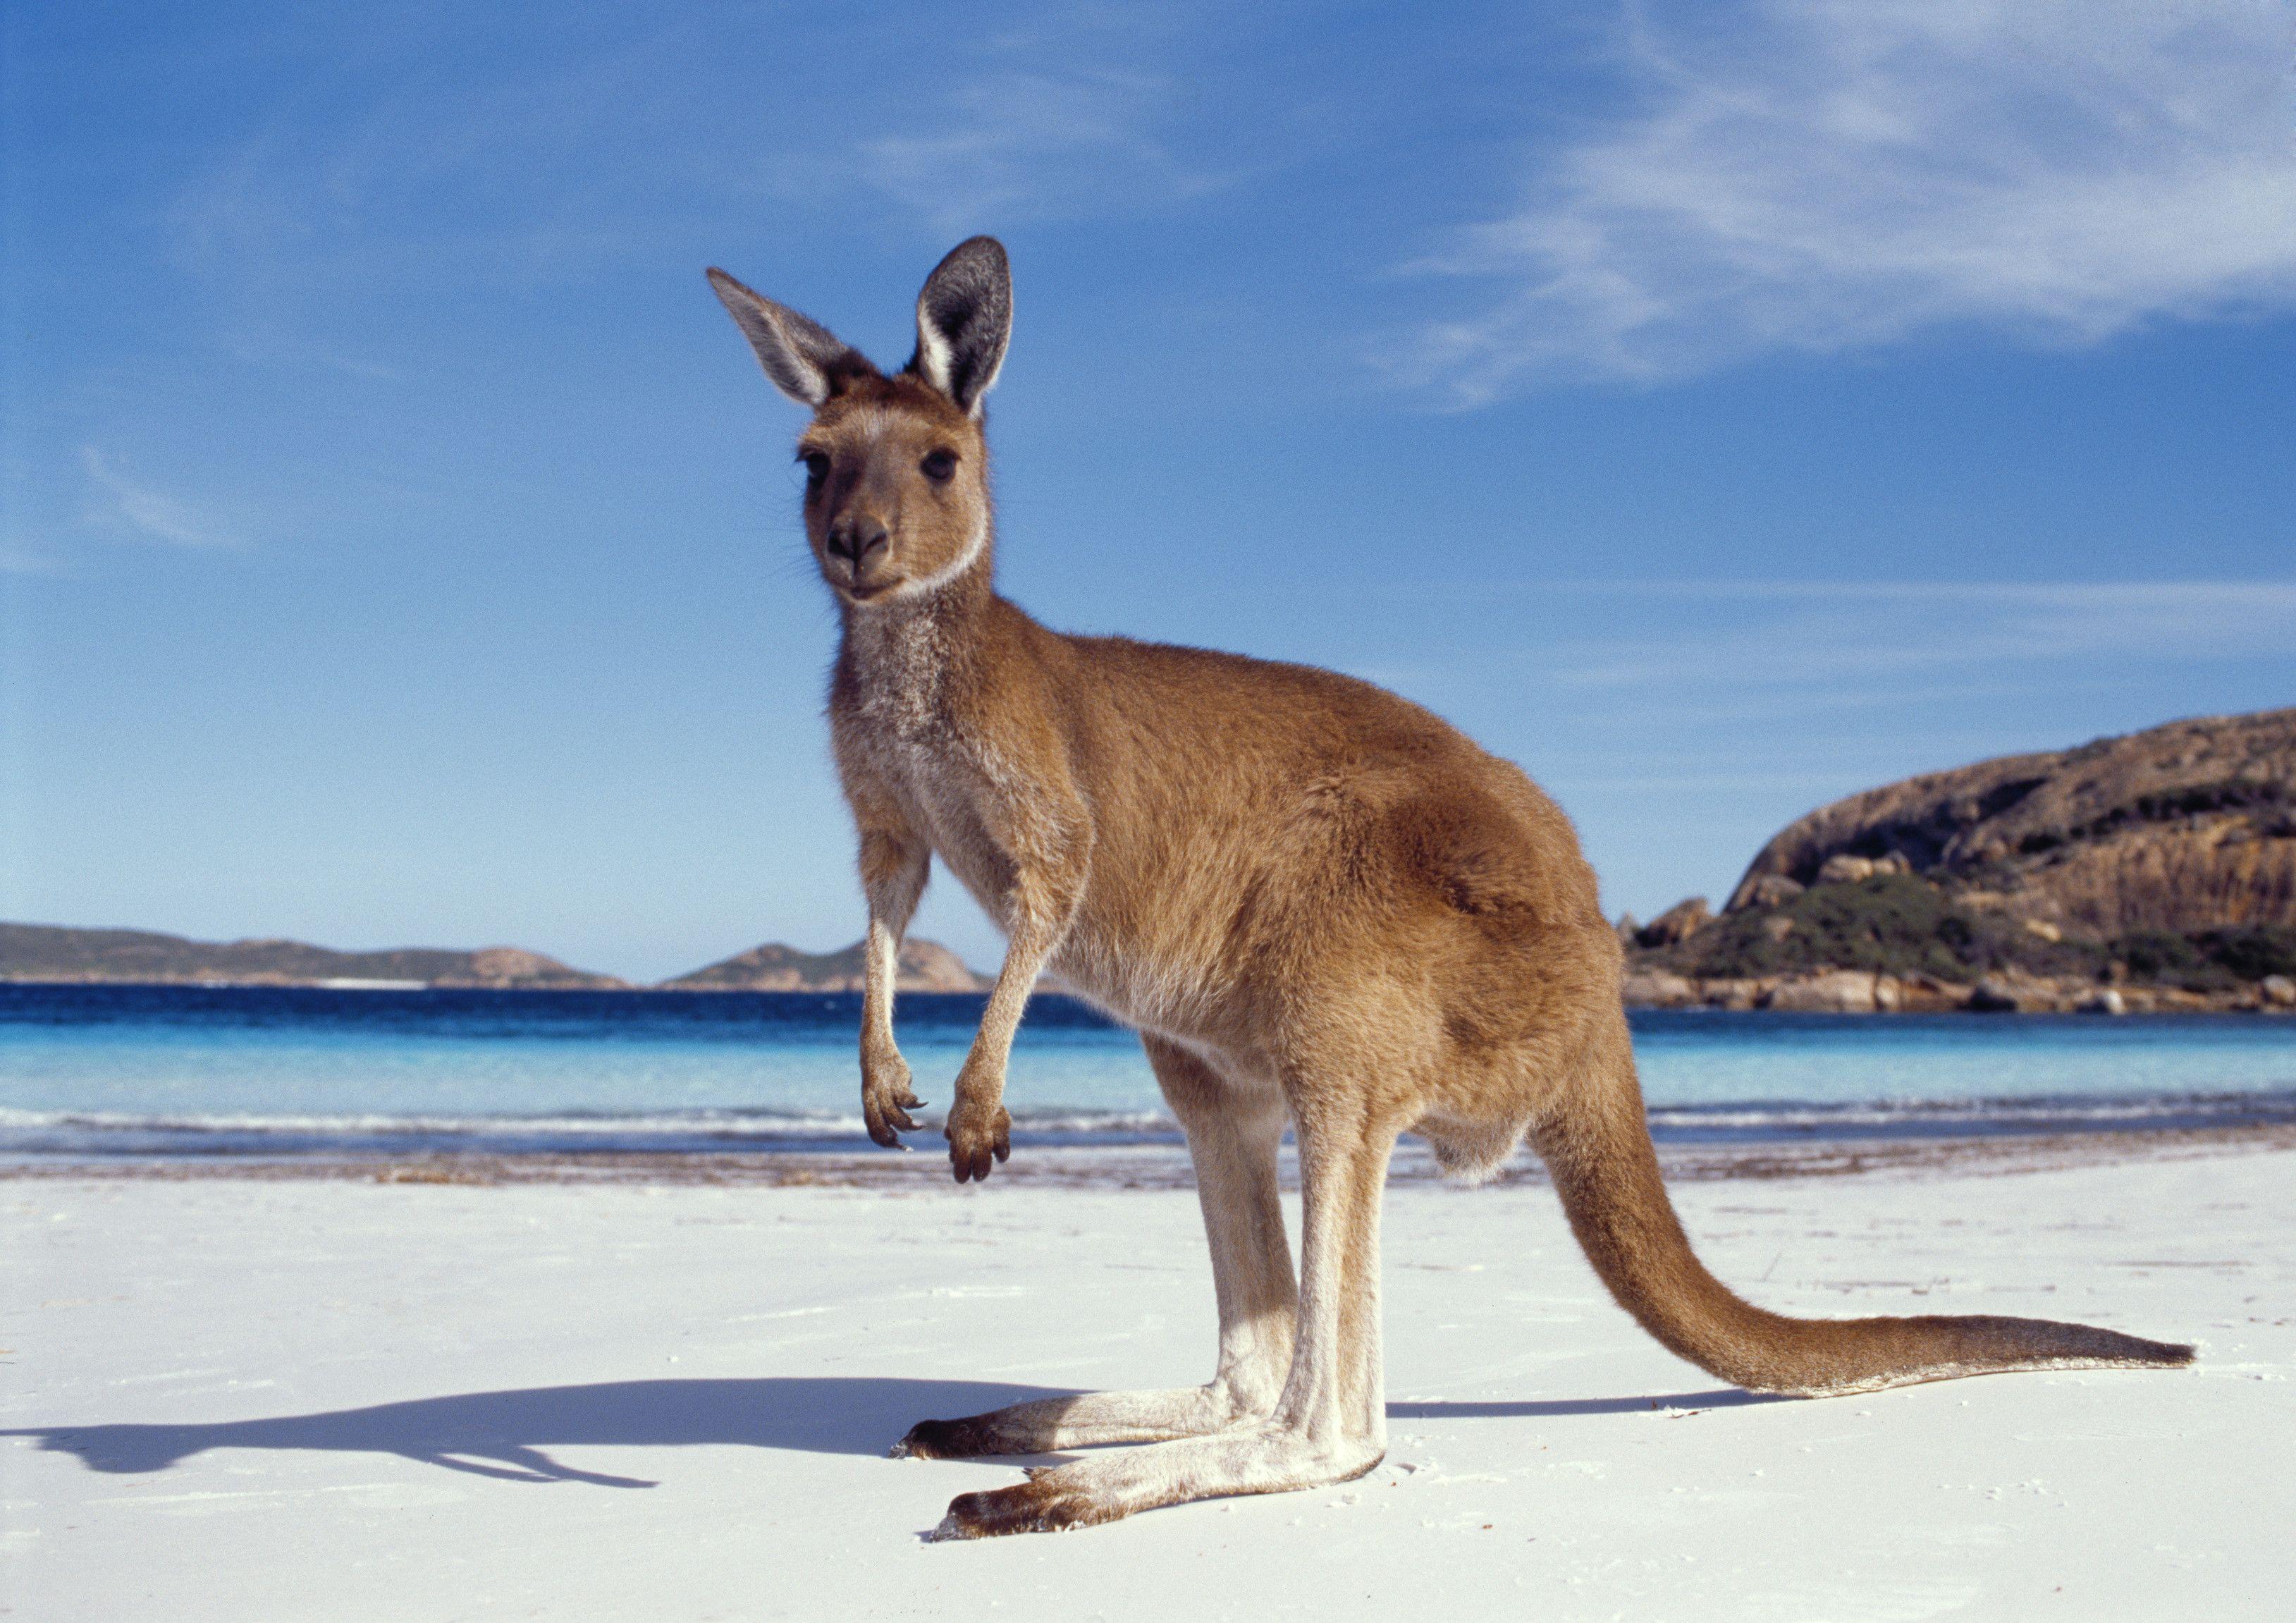 australian kangaroo | NATURE | Pinterest | Kangaroos, Animal and ...